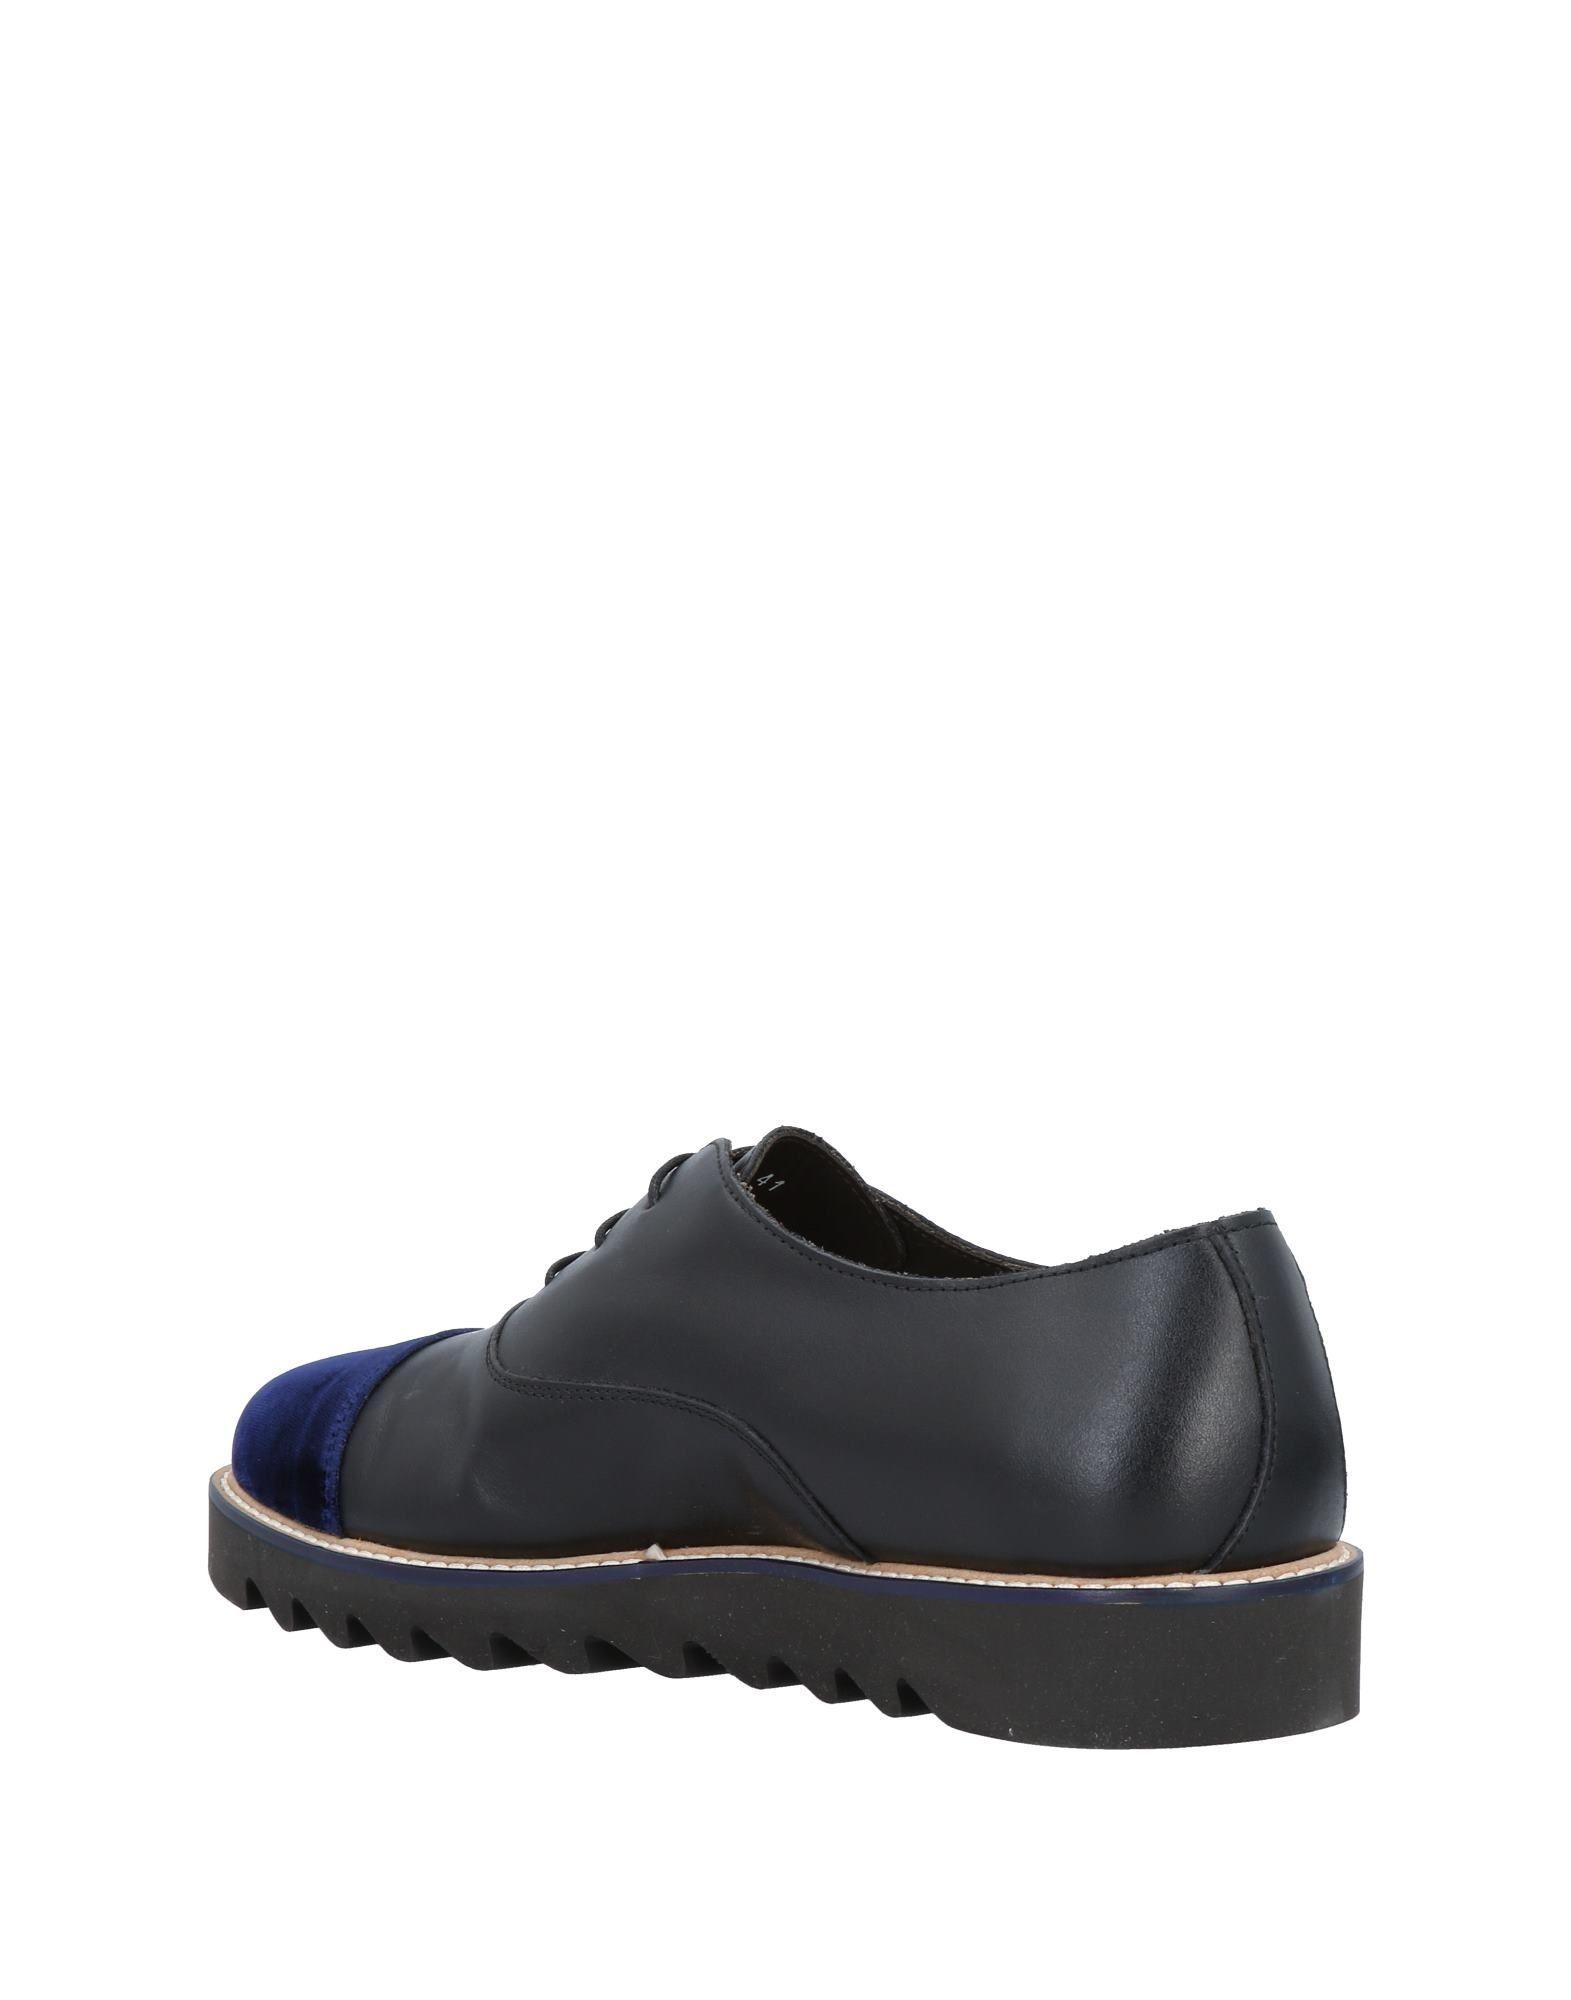 Rabatt echte Schuhe ( Verba 11484380DU ) Schnürschuhe Herren  11484380DU Verba 9186db